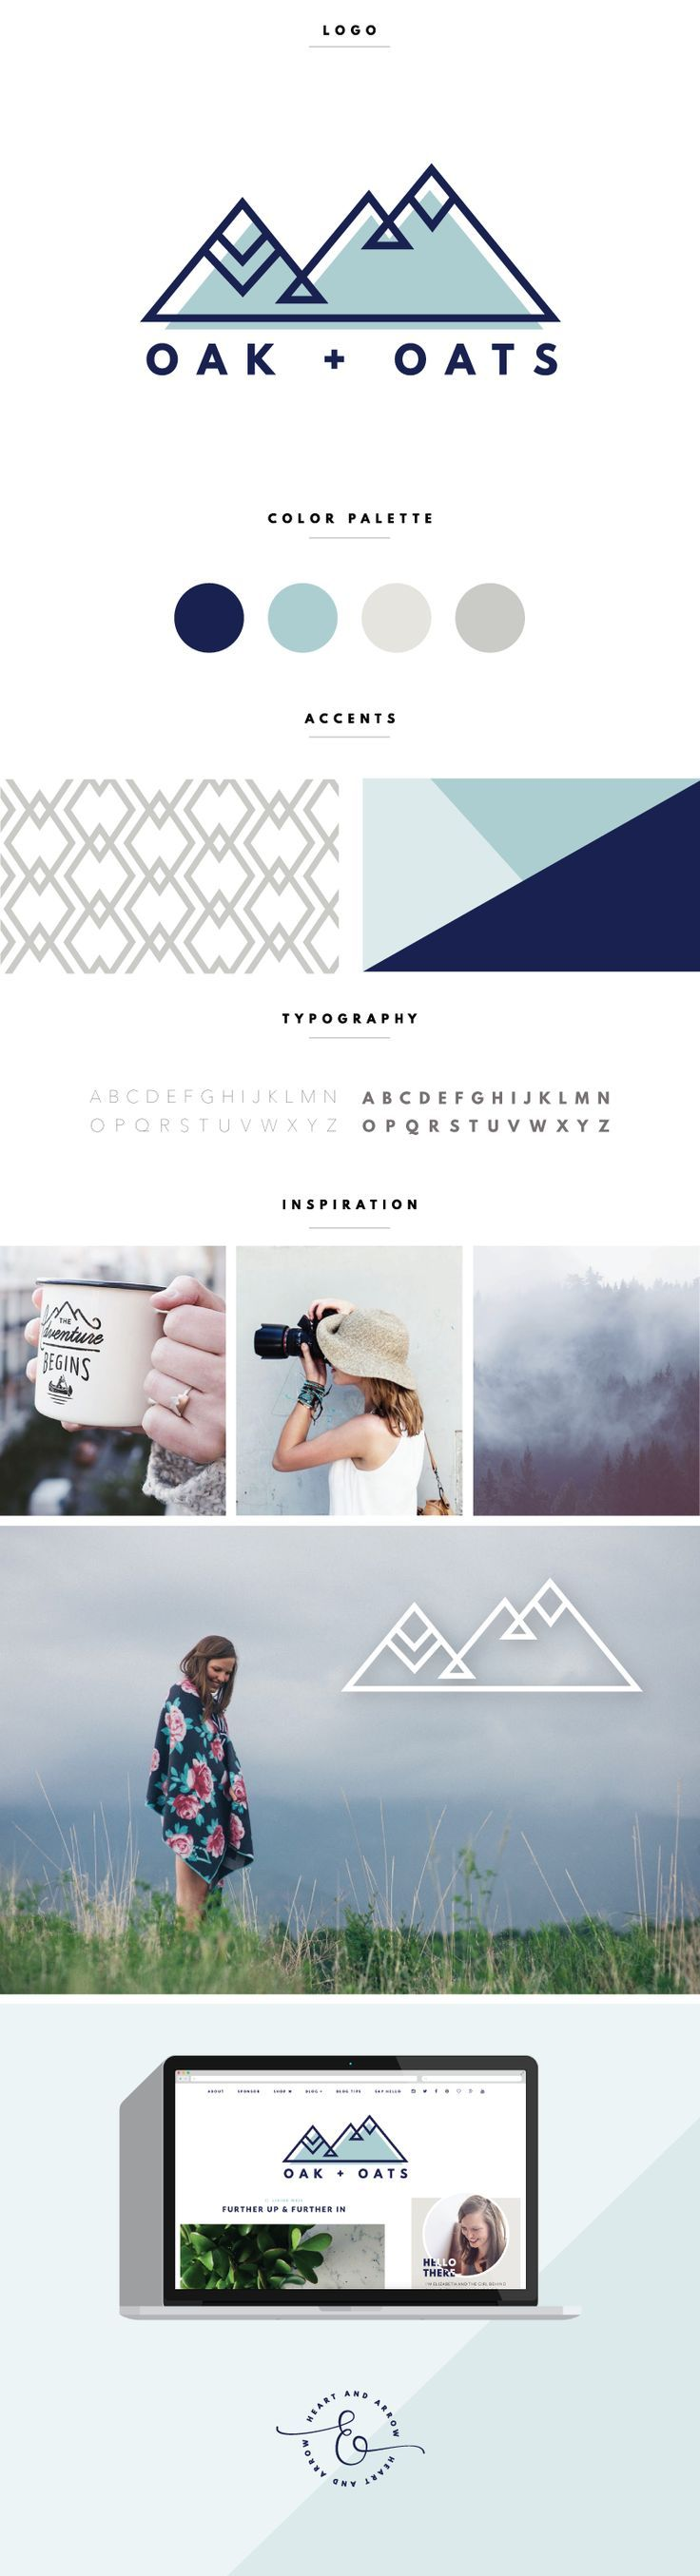 Modern Geometric Blog Logo and Design  /  by Heart & Arrow